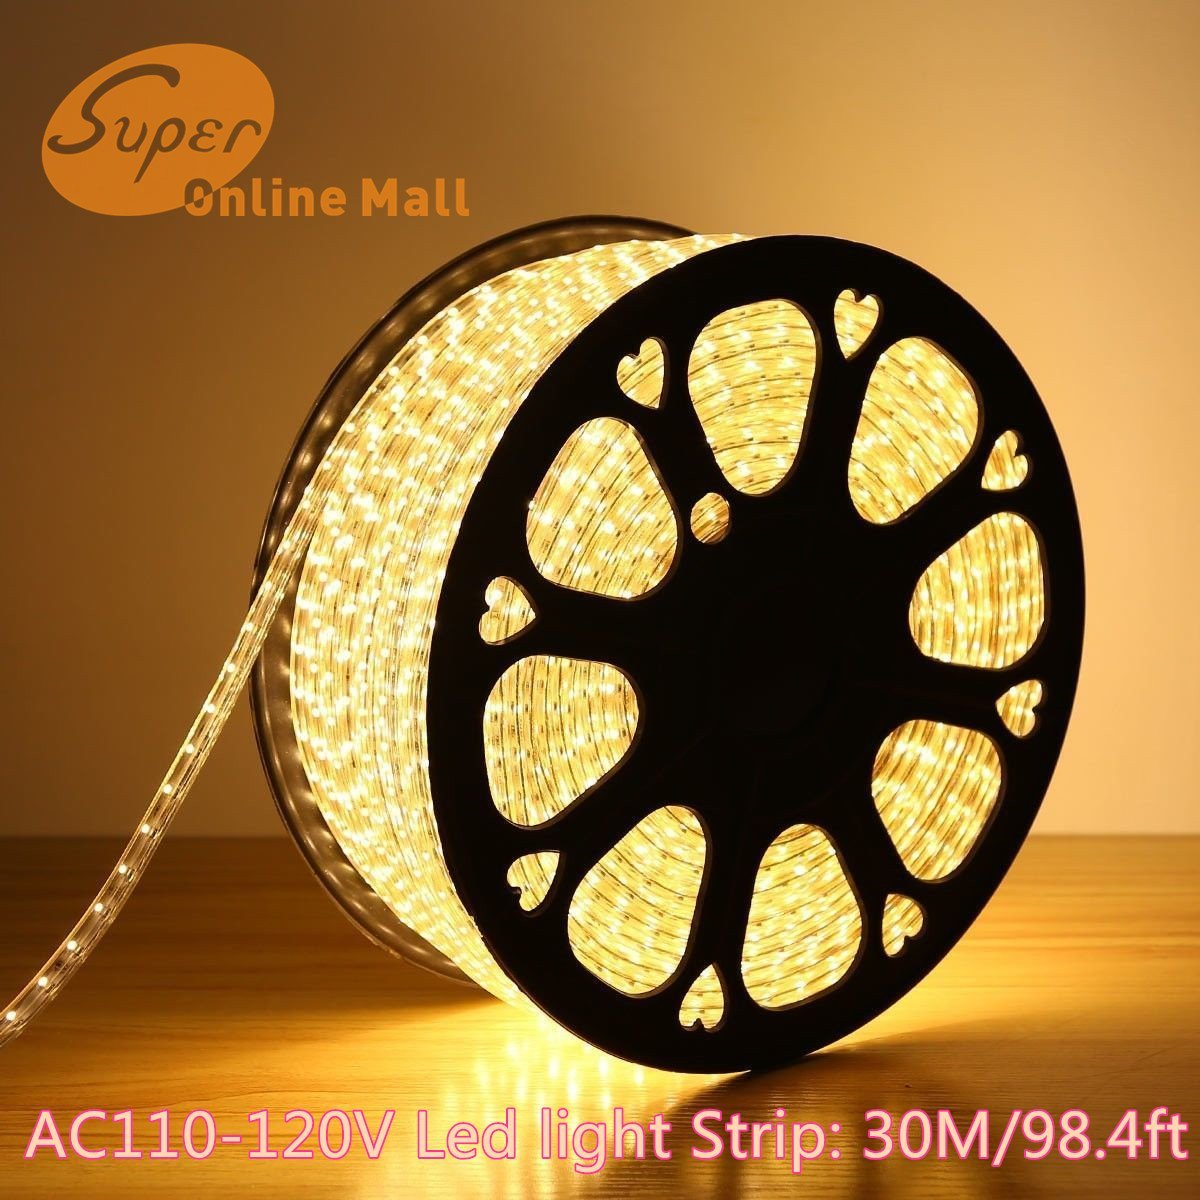 SuperonlineMall AC 110-120V Flexible Waterproof LED Strip Lights, 30m/98.4ft - Warm White